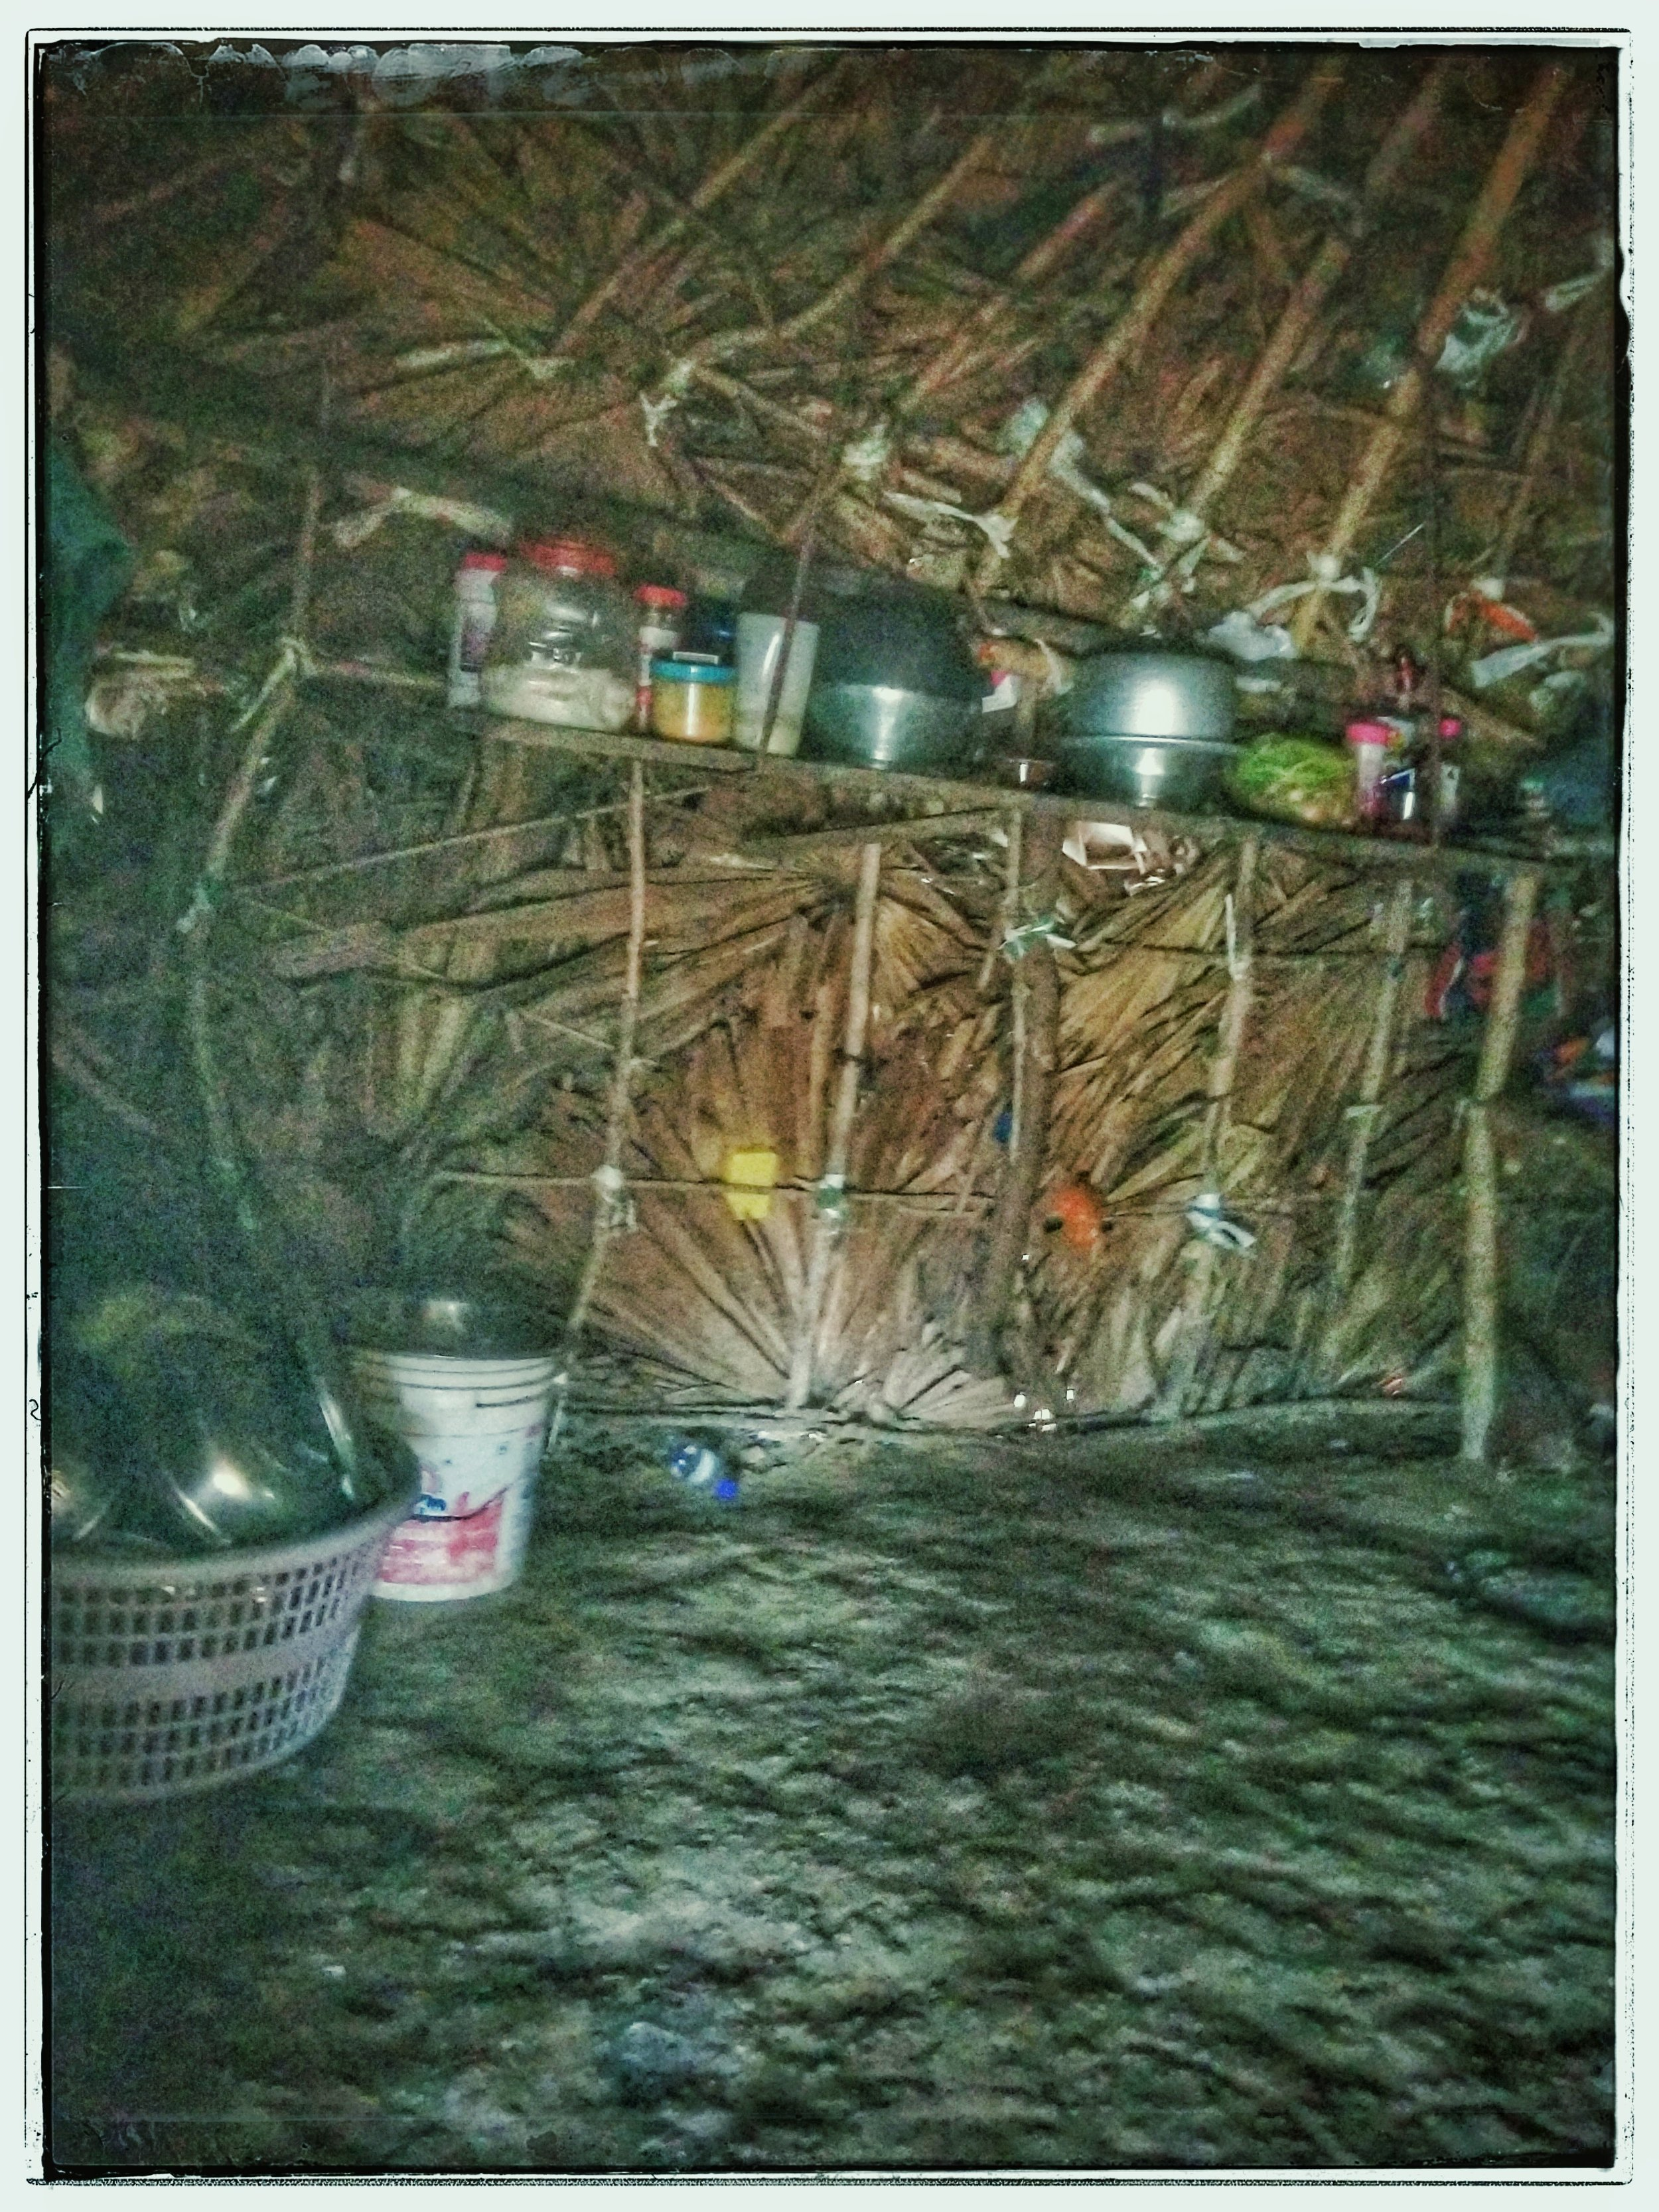 Inside a typical untouchable hut.